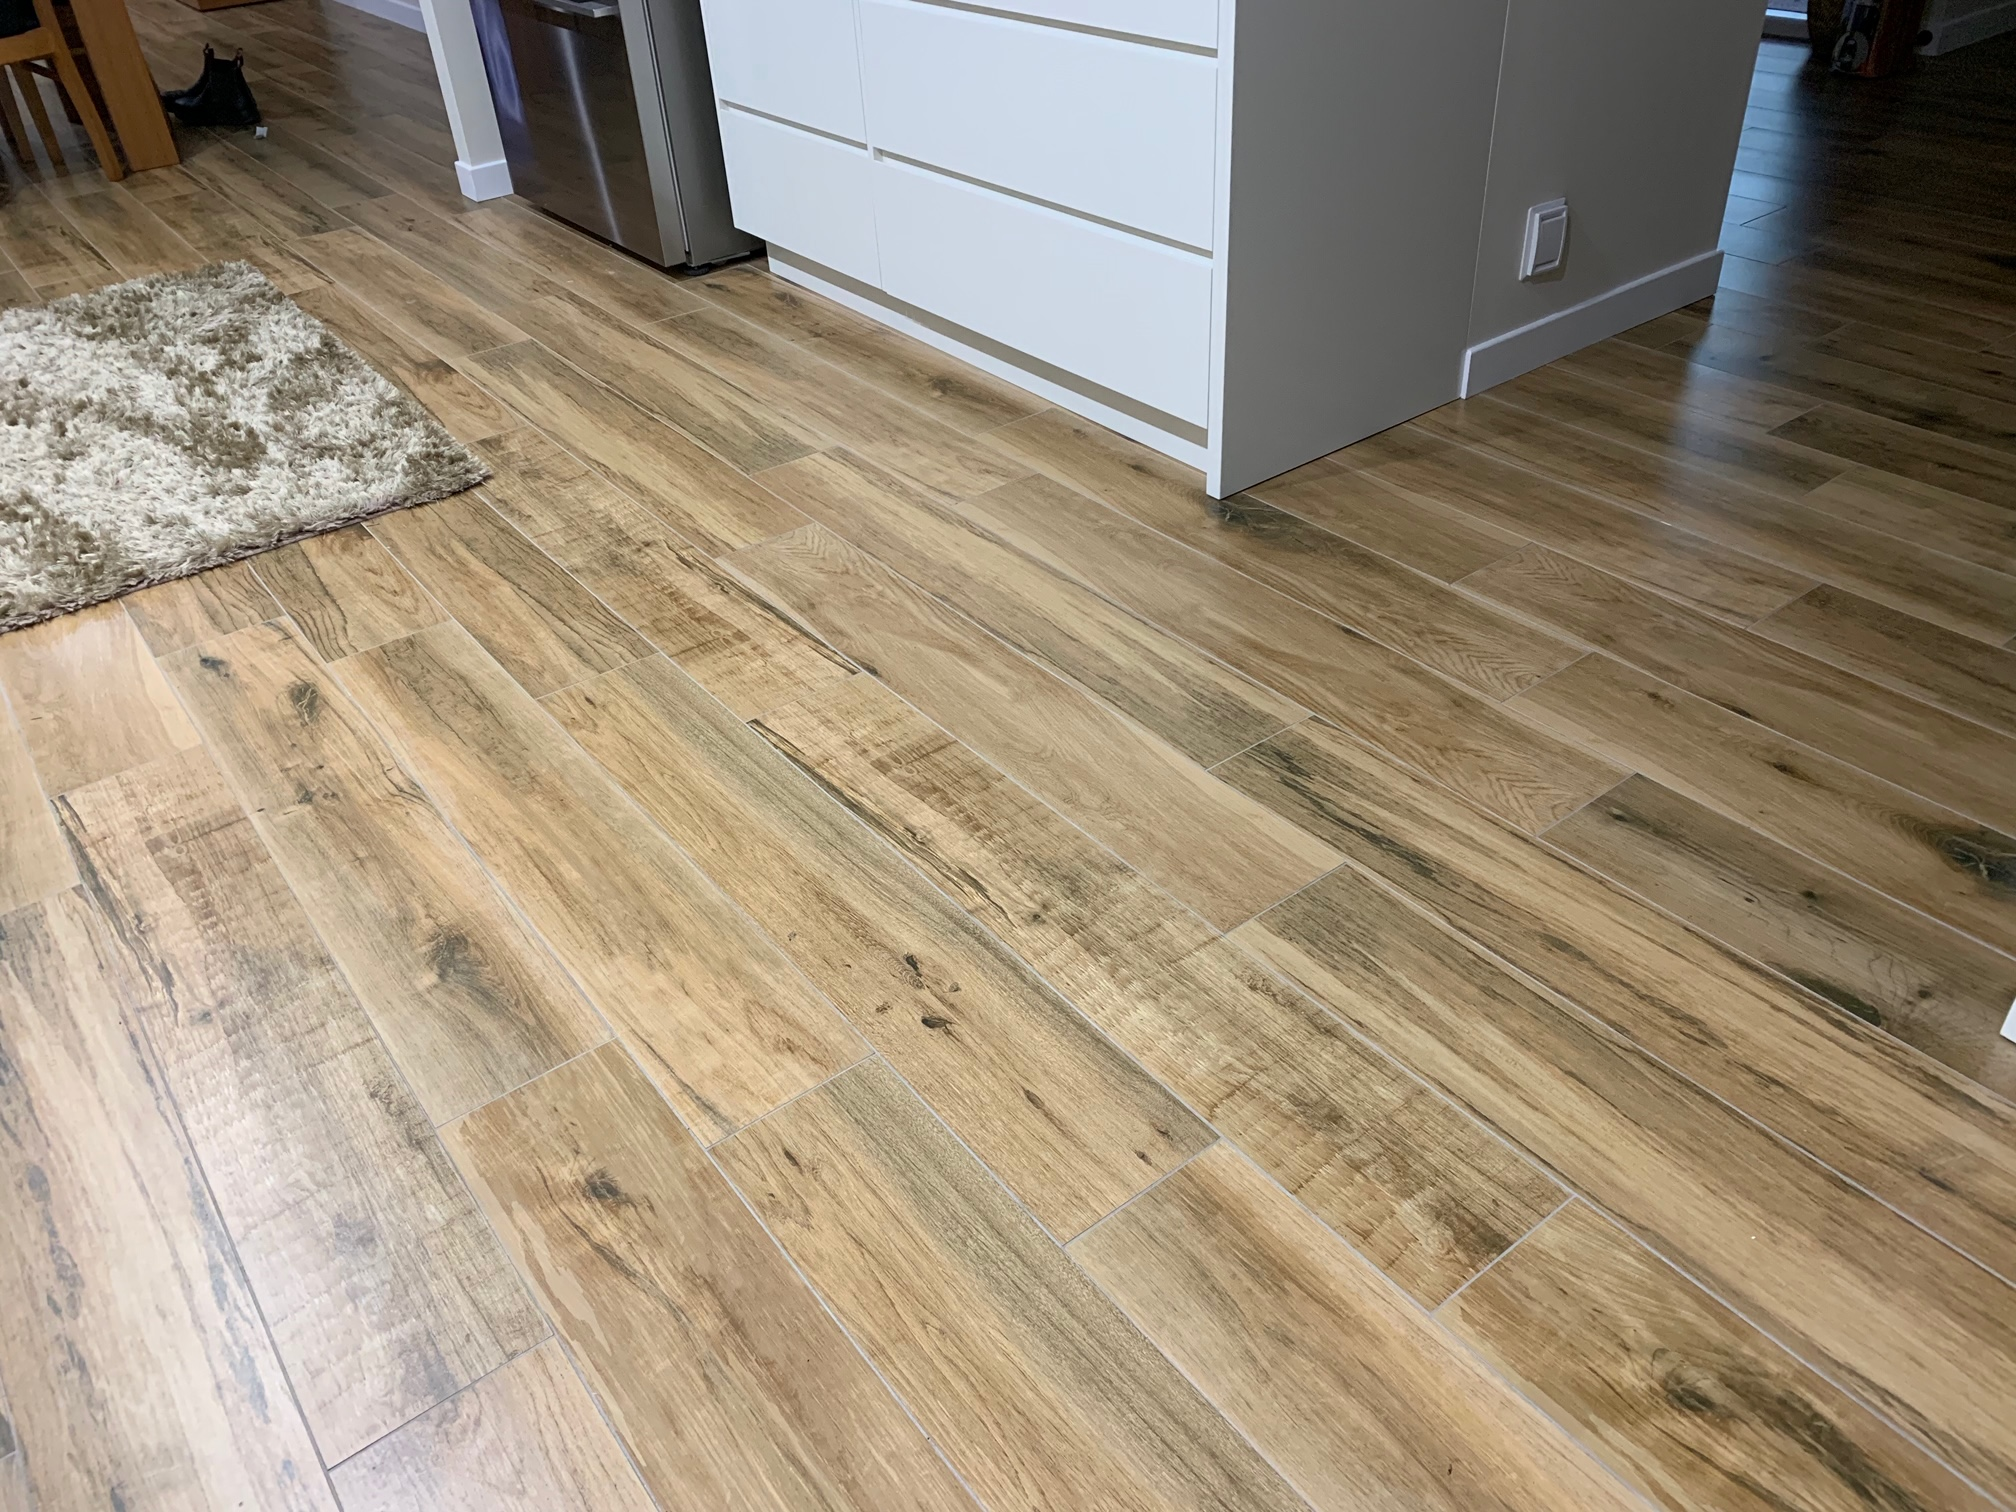 Natural wooden floor with warmtech undertile heating